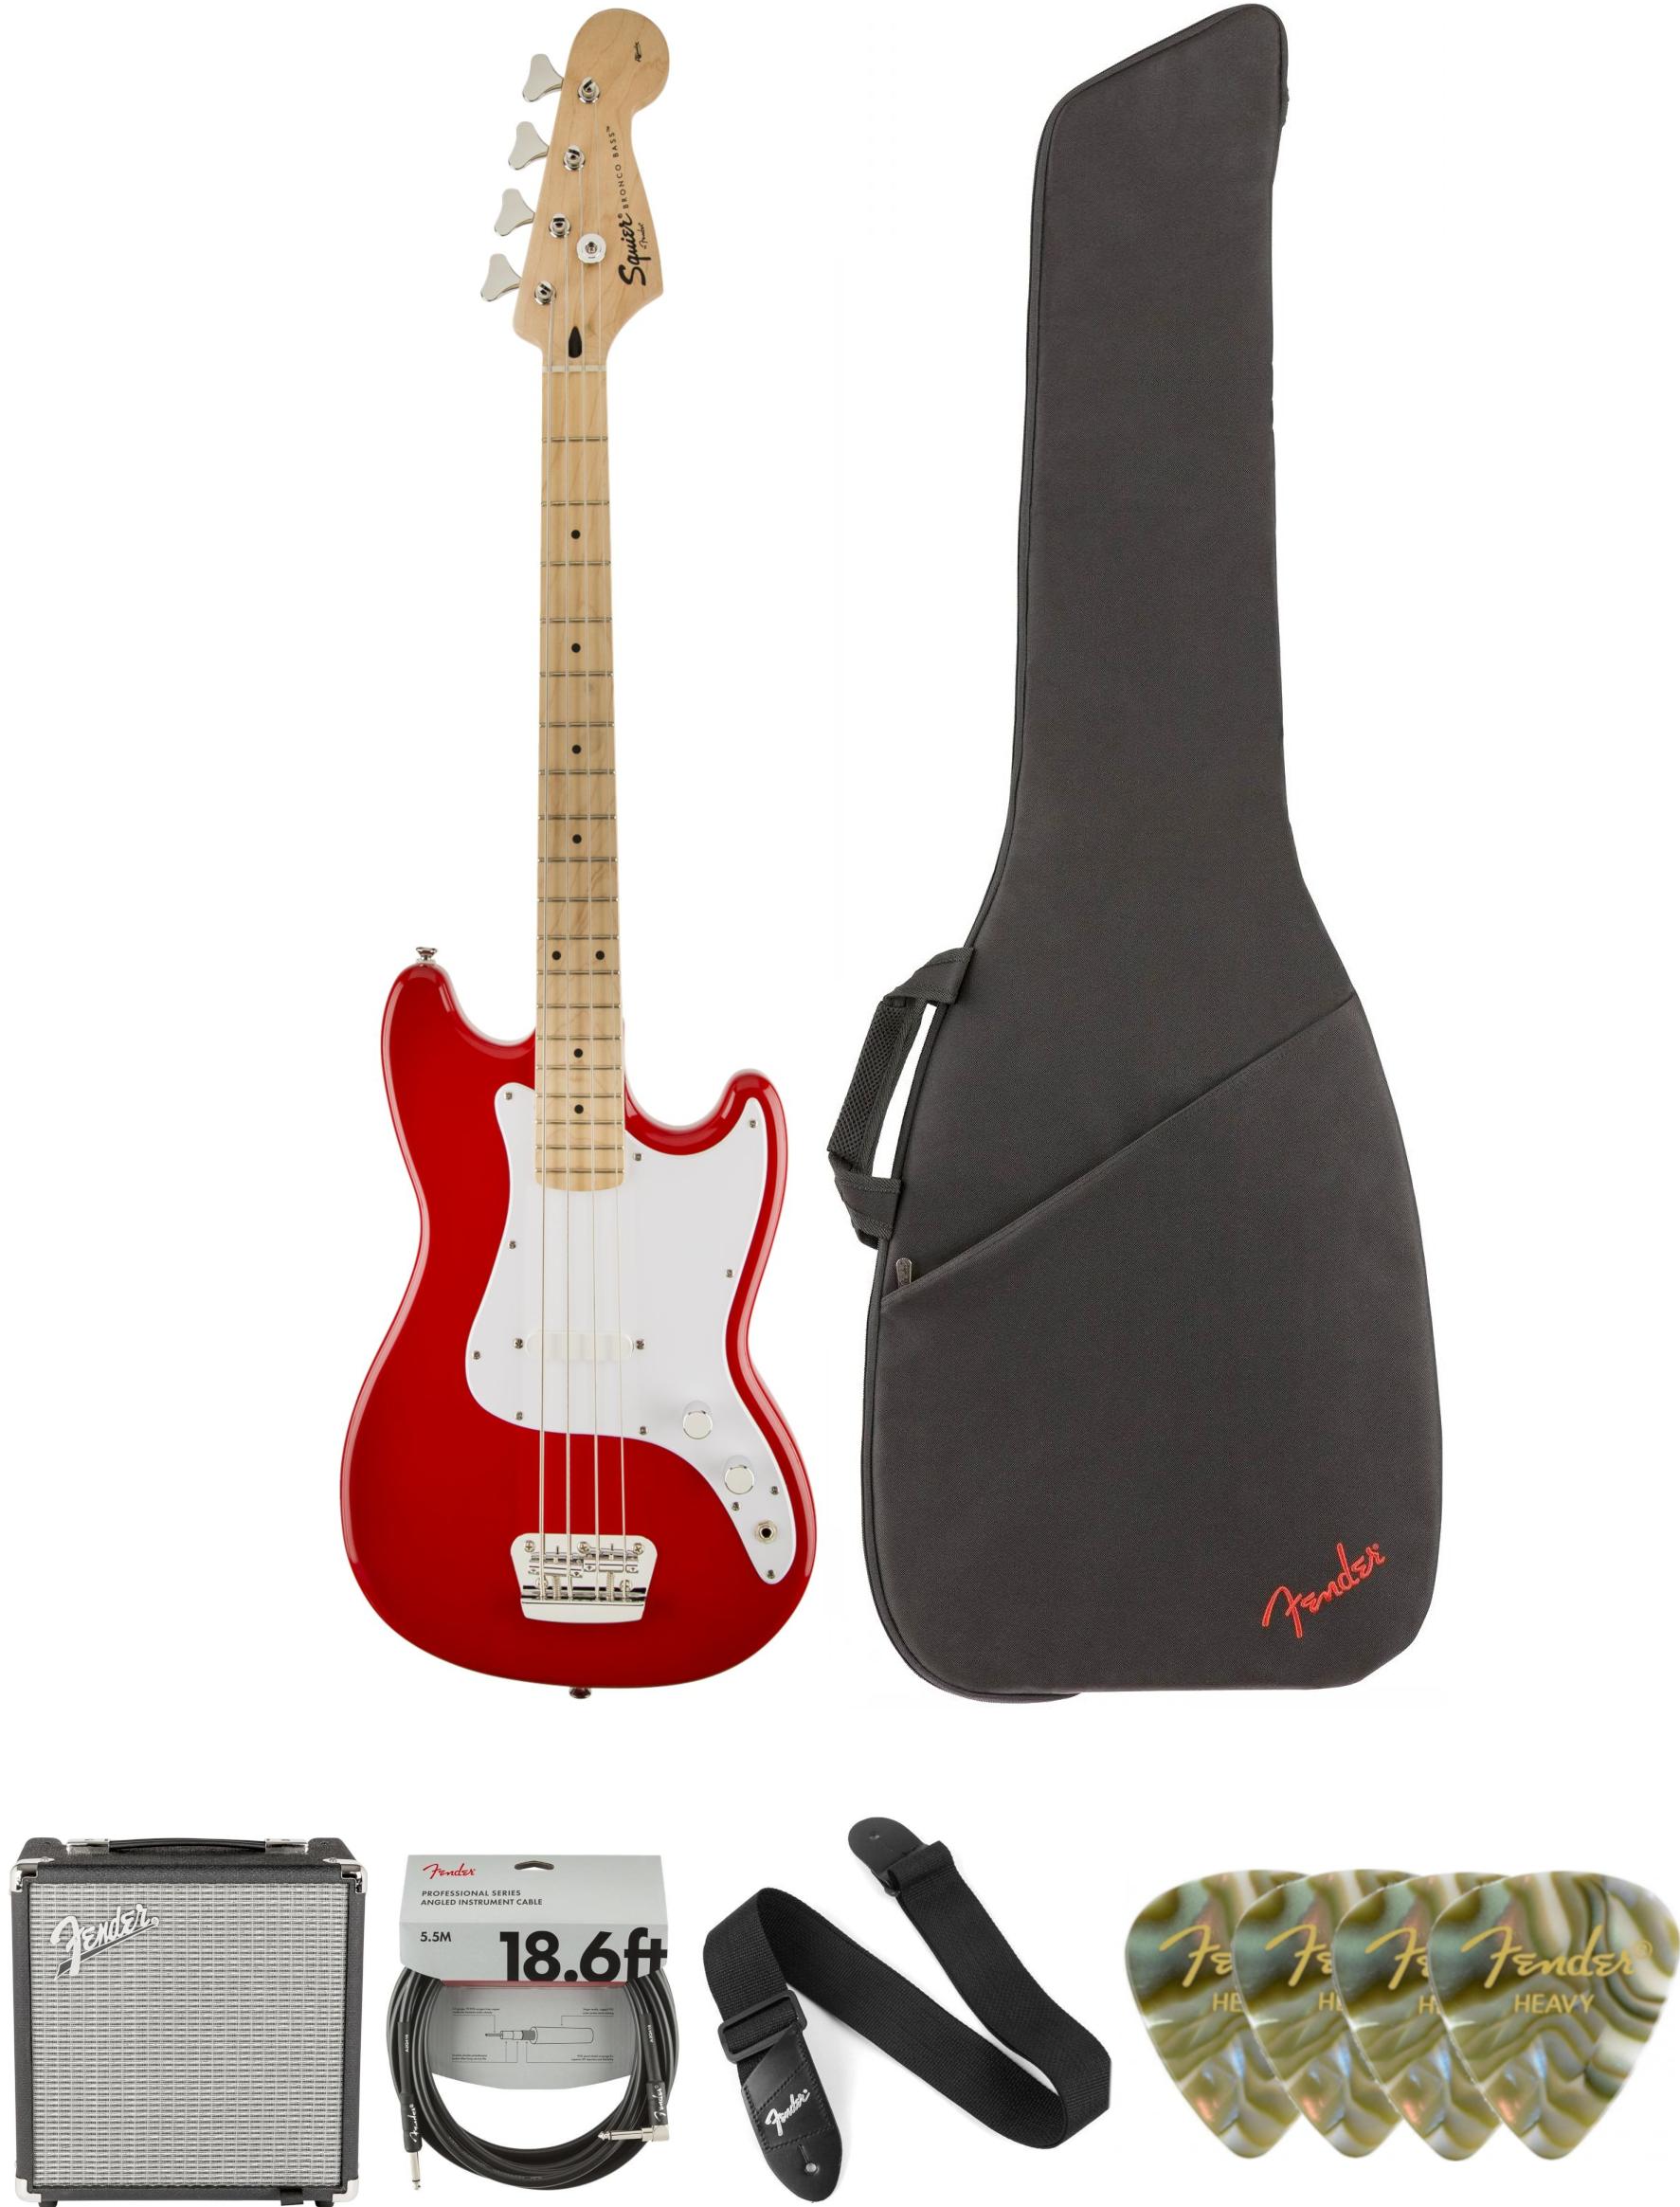 Fender Squier Affinity Series Bronco Bass MN Black